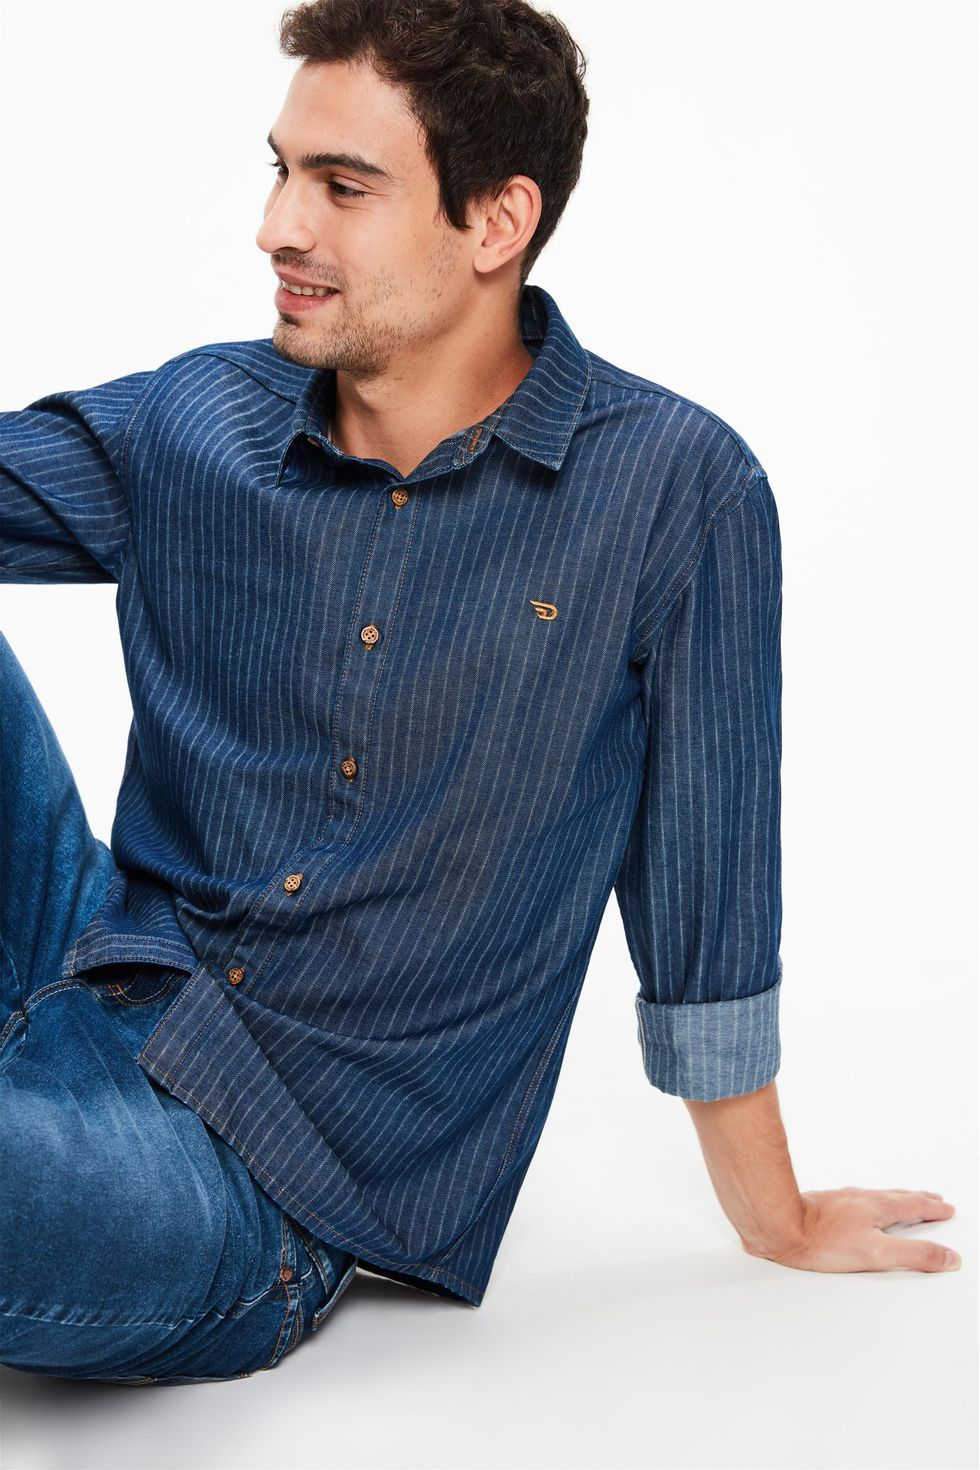 Camisa-Jeans-Listrada-Ecodamyller-Frente--